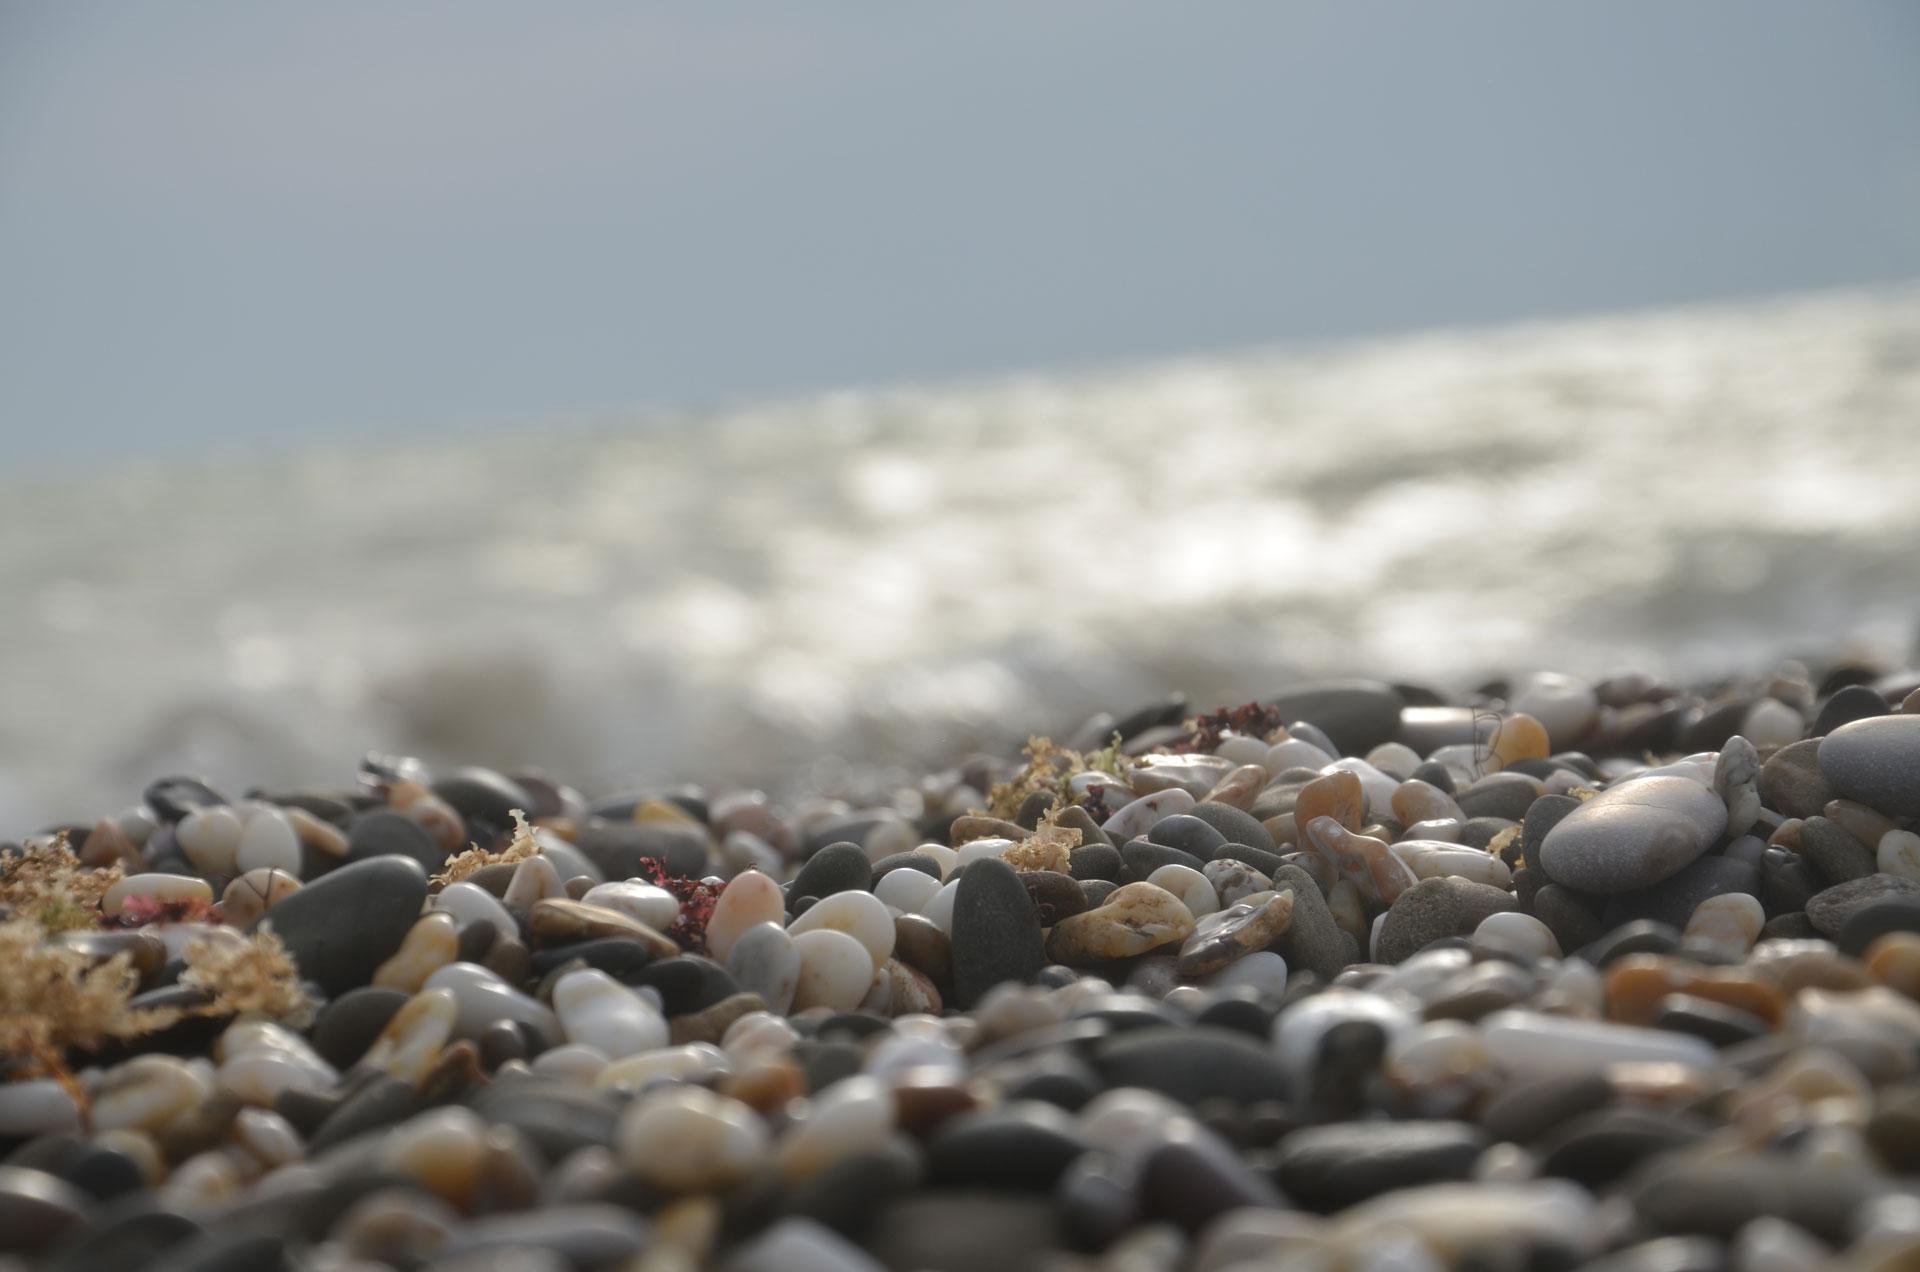 Галька на диком пляже 2019. Фото Евпатории